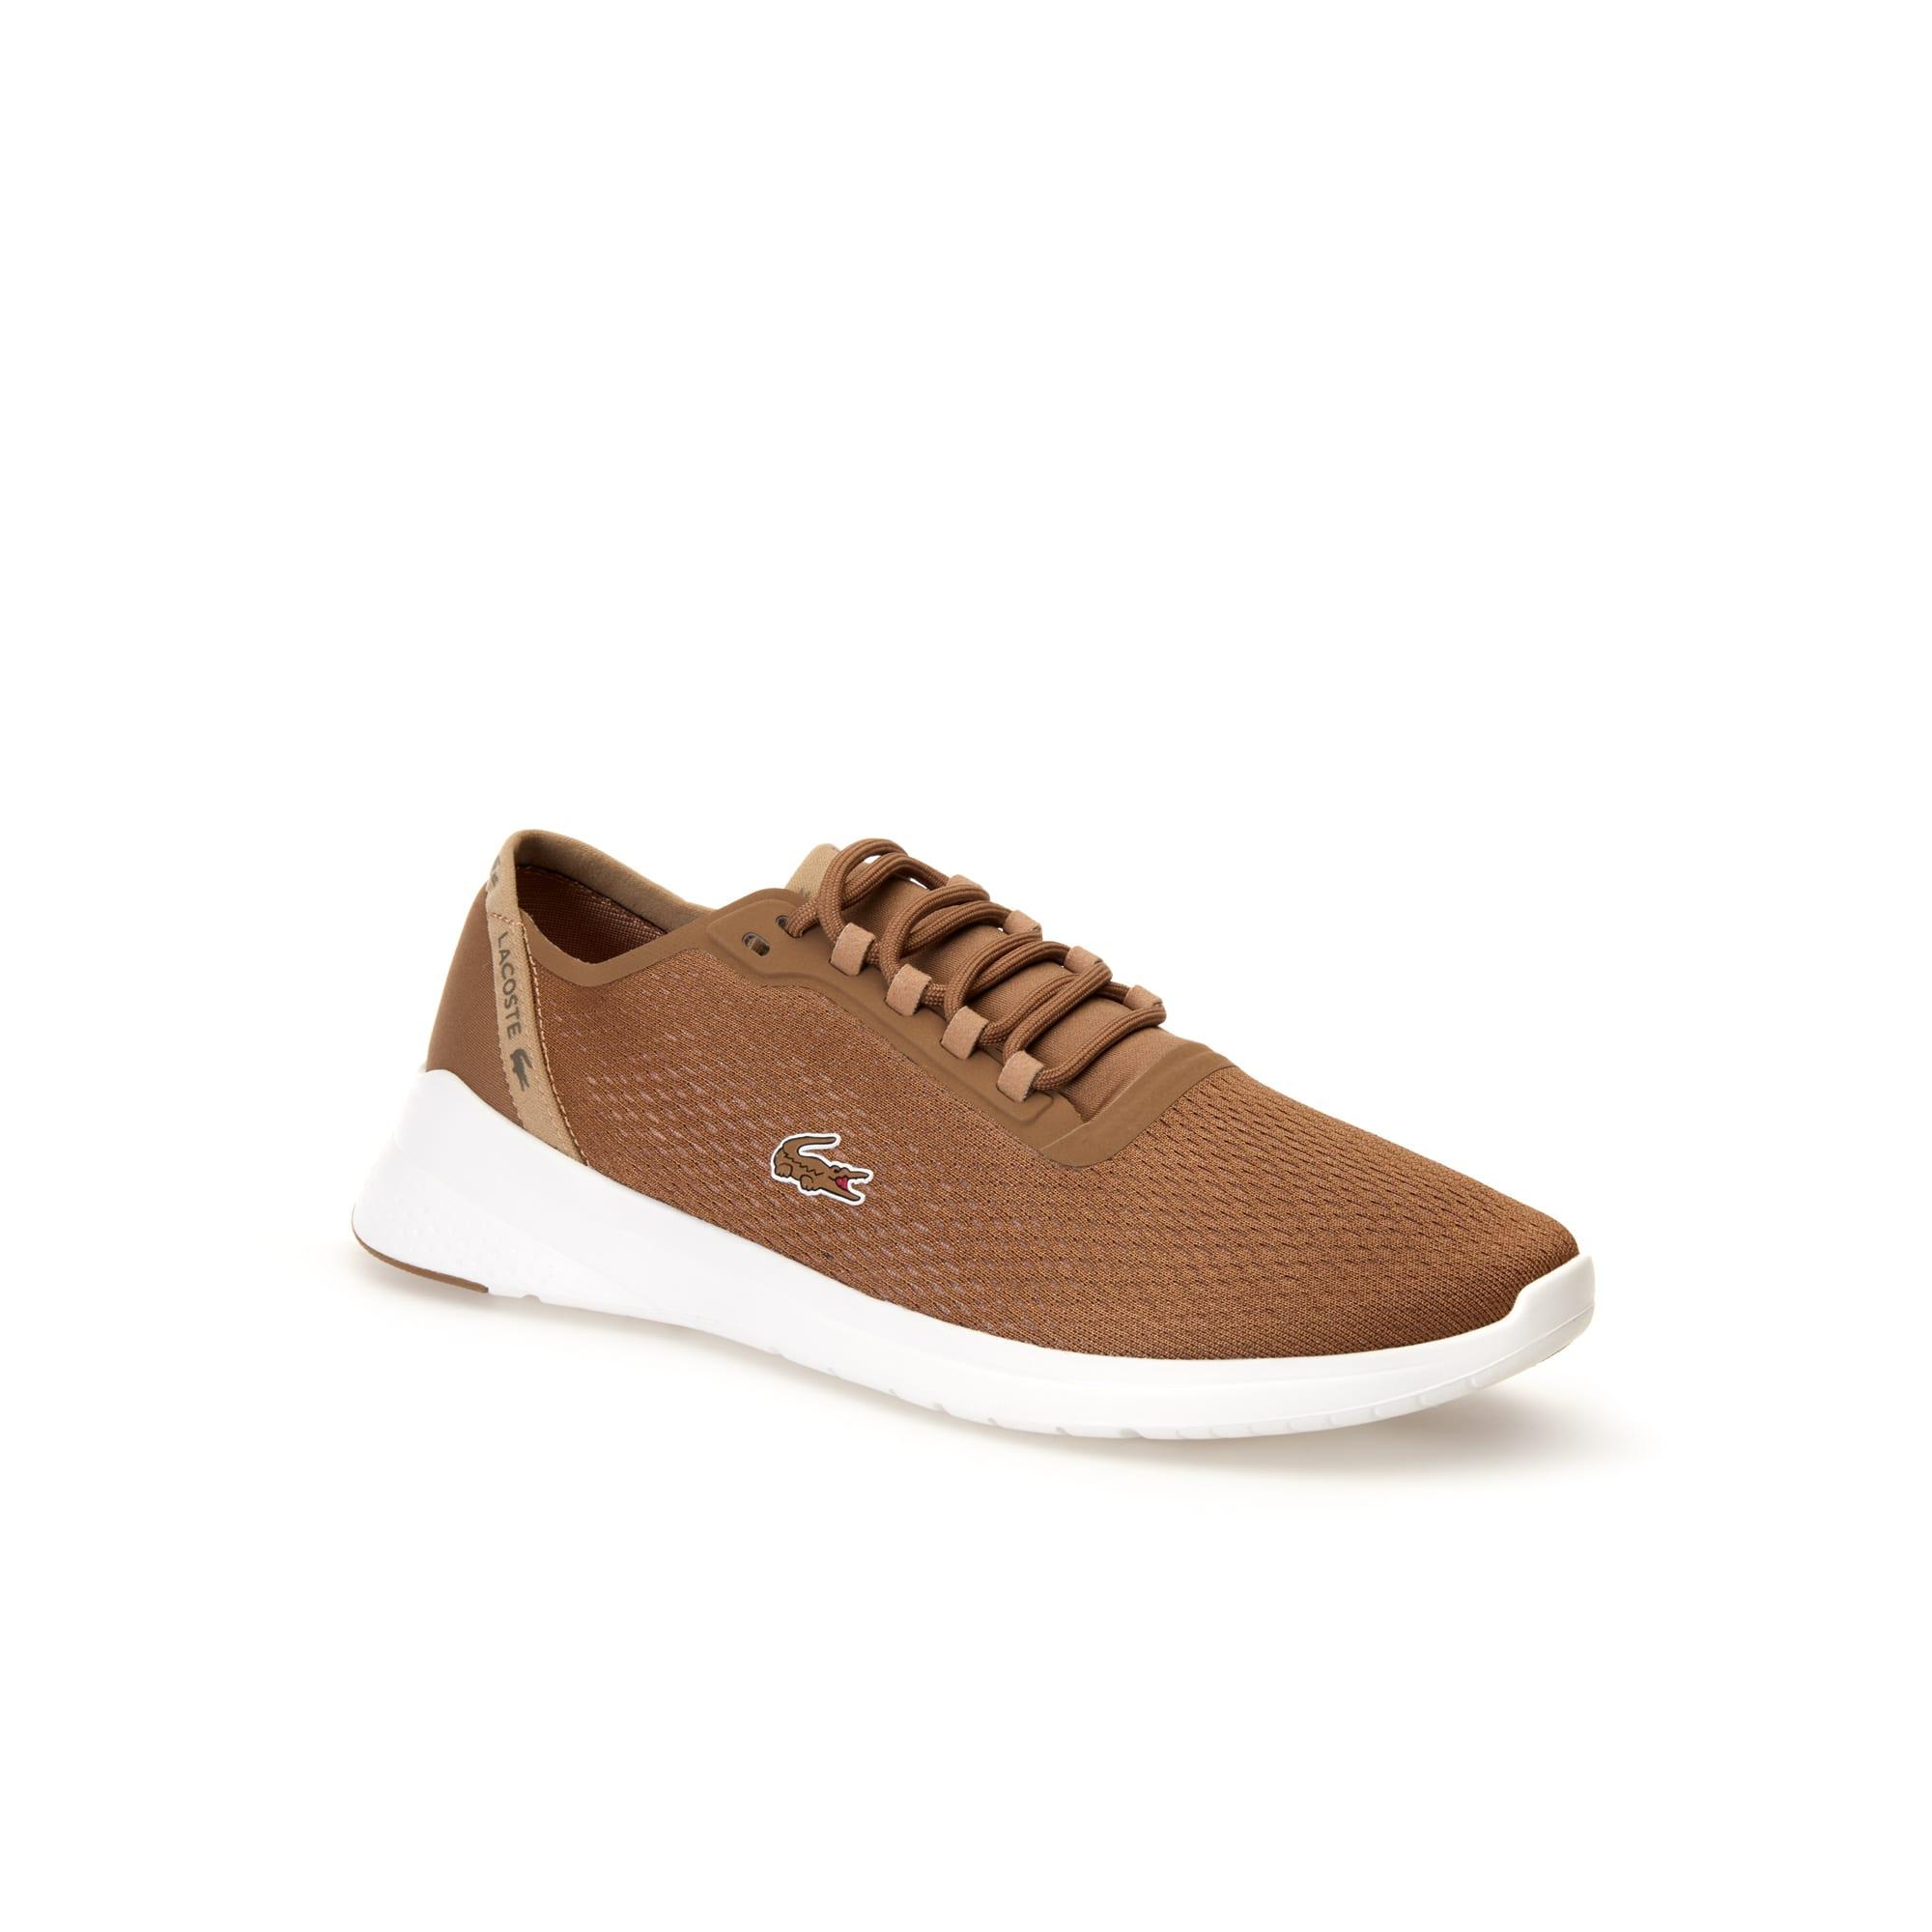 fde52d4eb أحذية LACOSTE - تسوق جميع أحذية LACOSTE عبر الإنترنت | LACOSTE